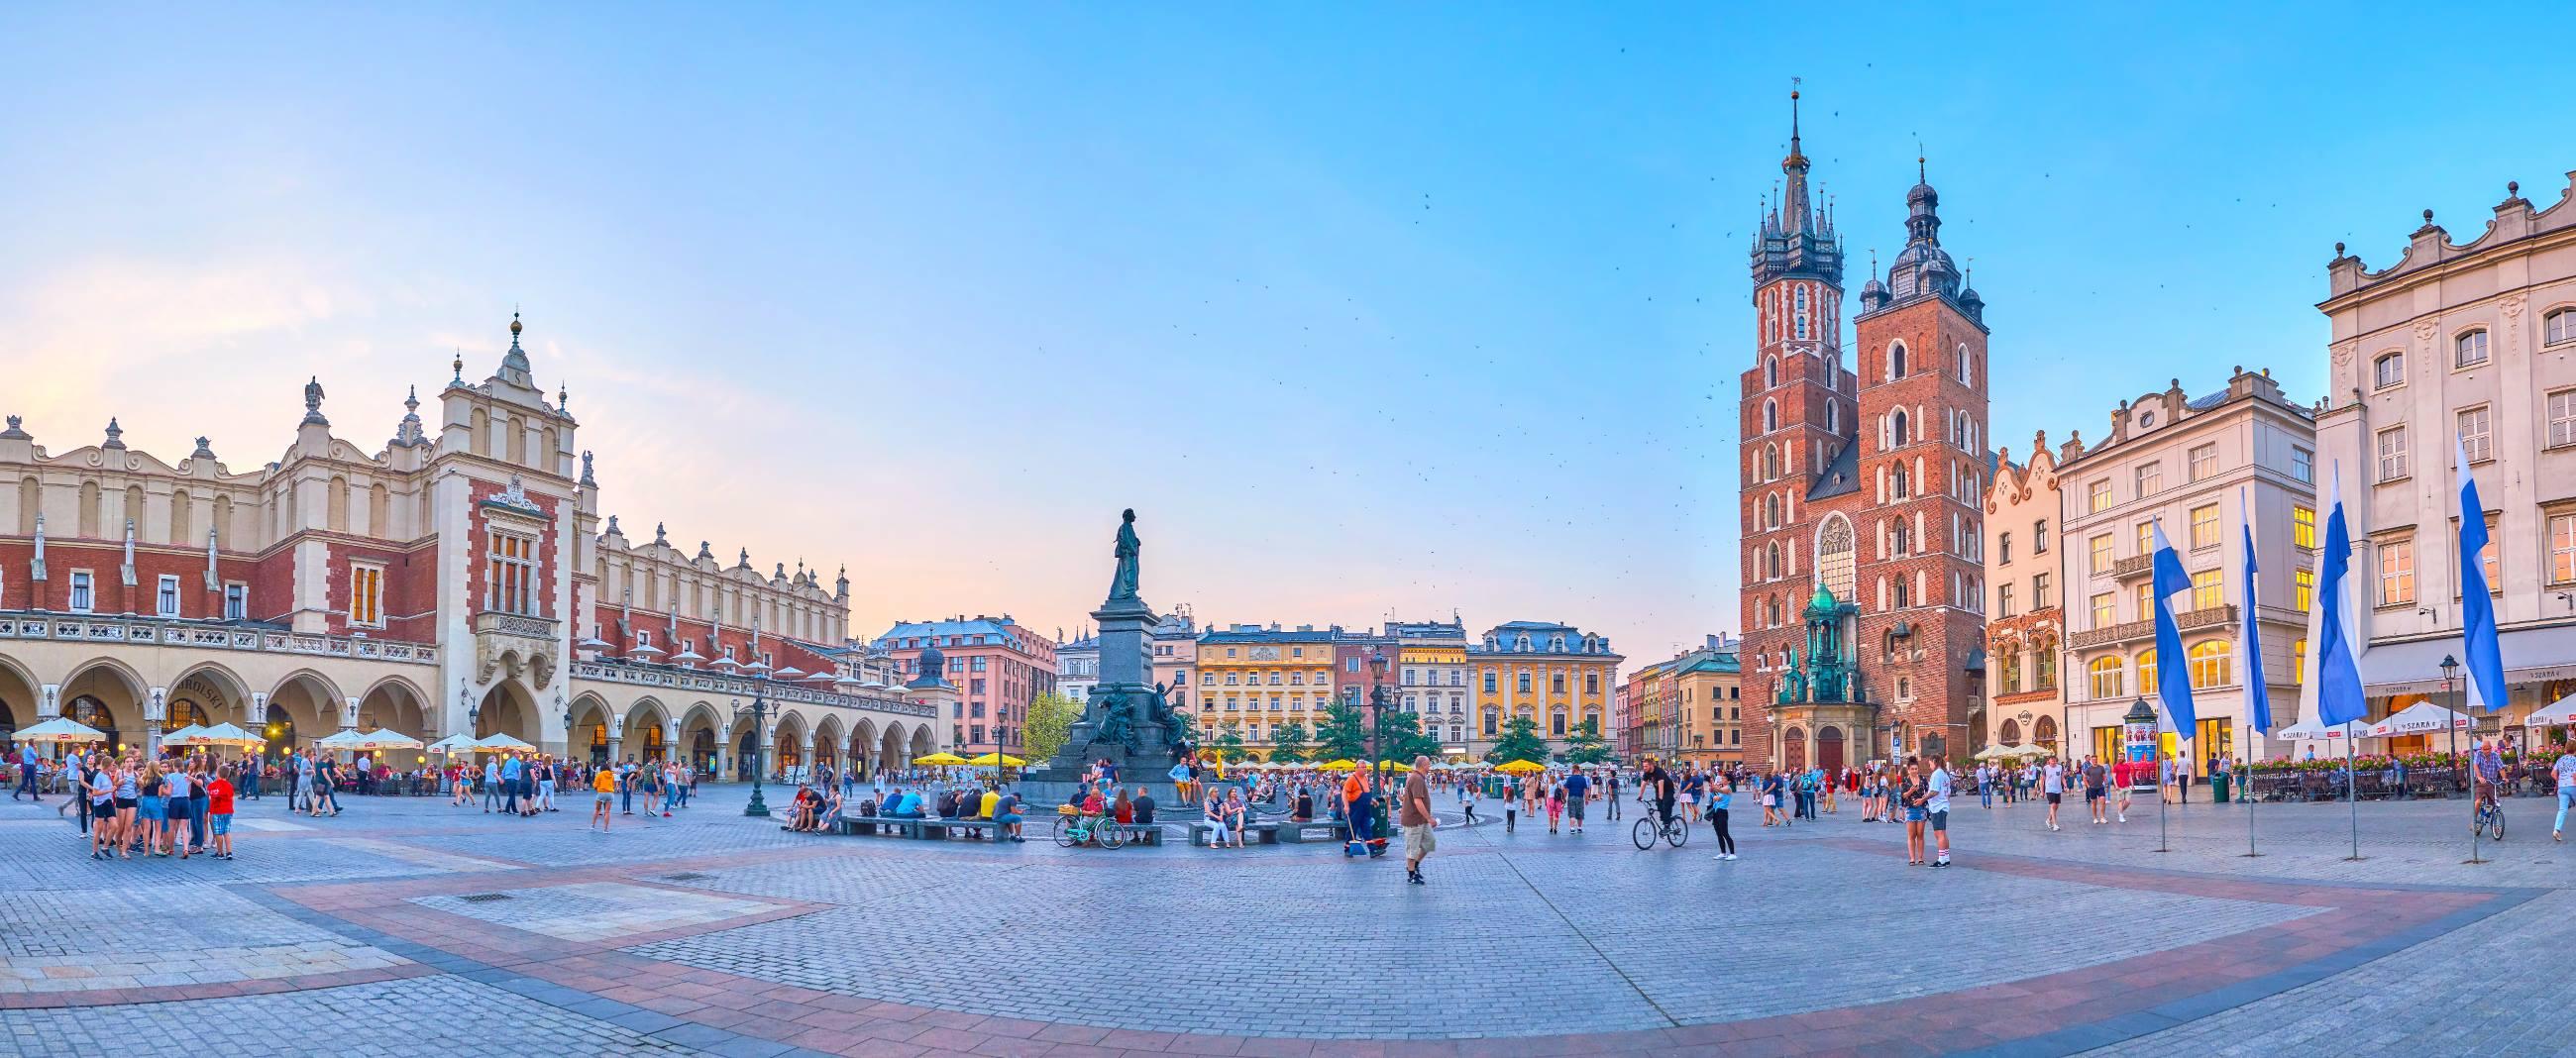 6-Unique-Restaurants-&-Bars-To-Visit-In-Kraków